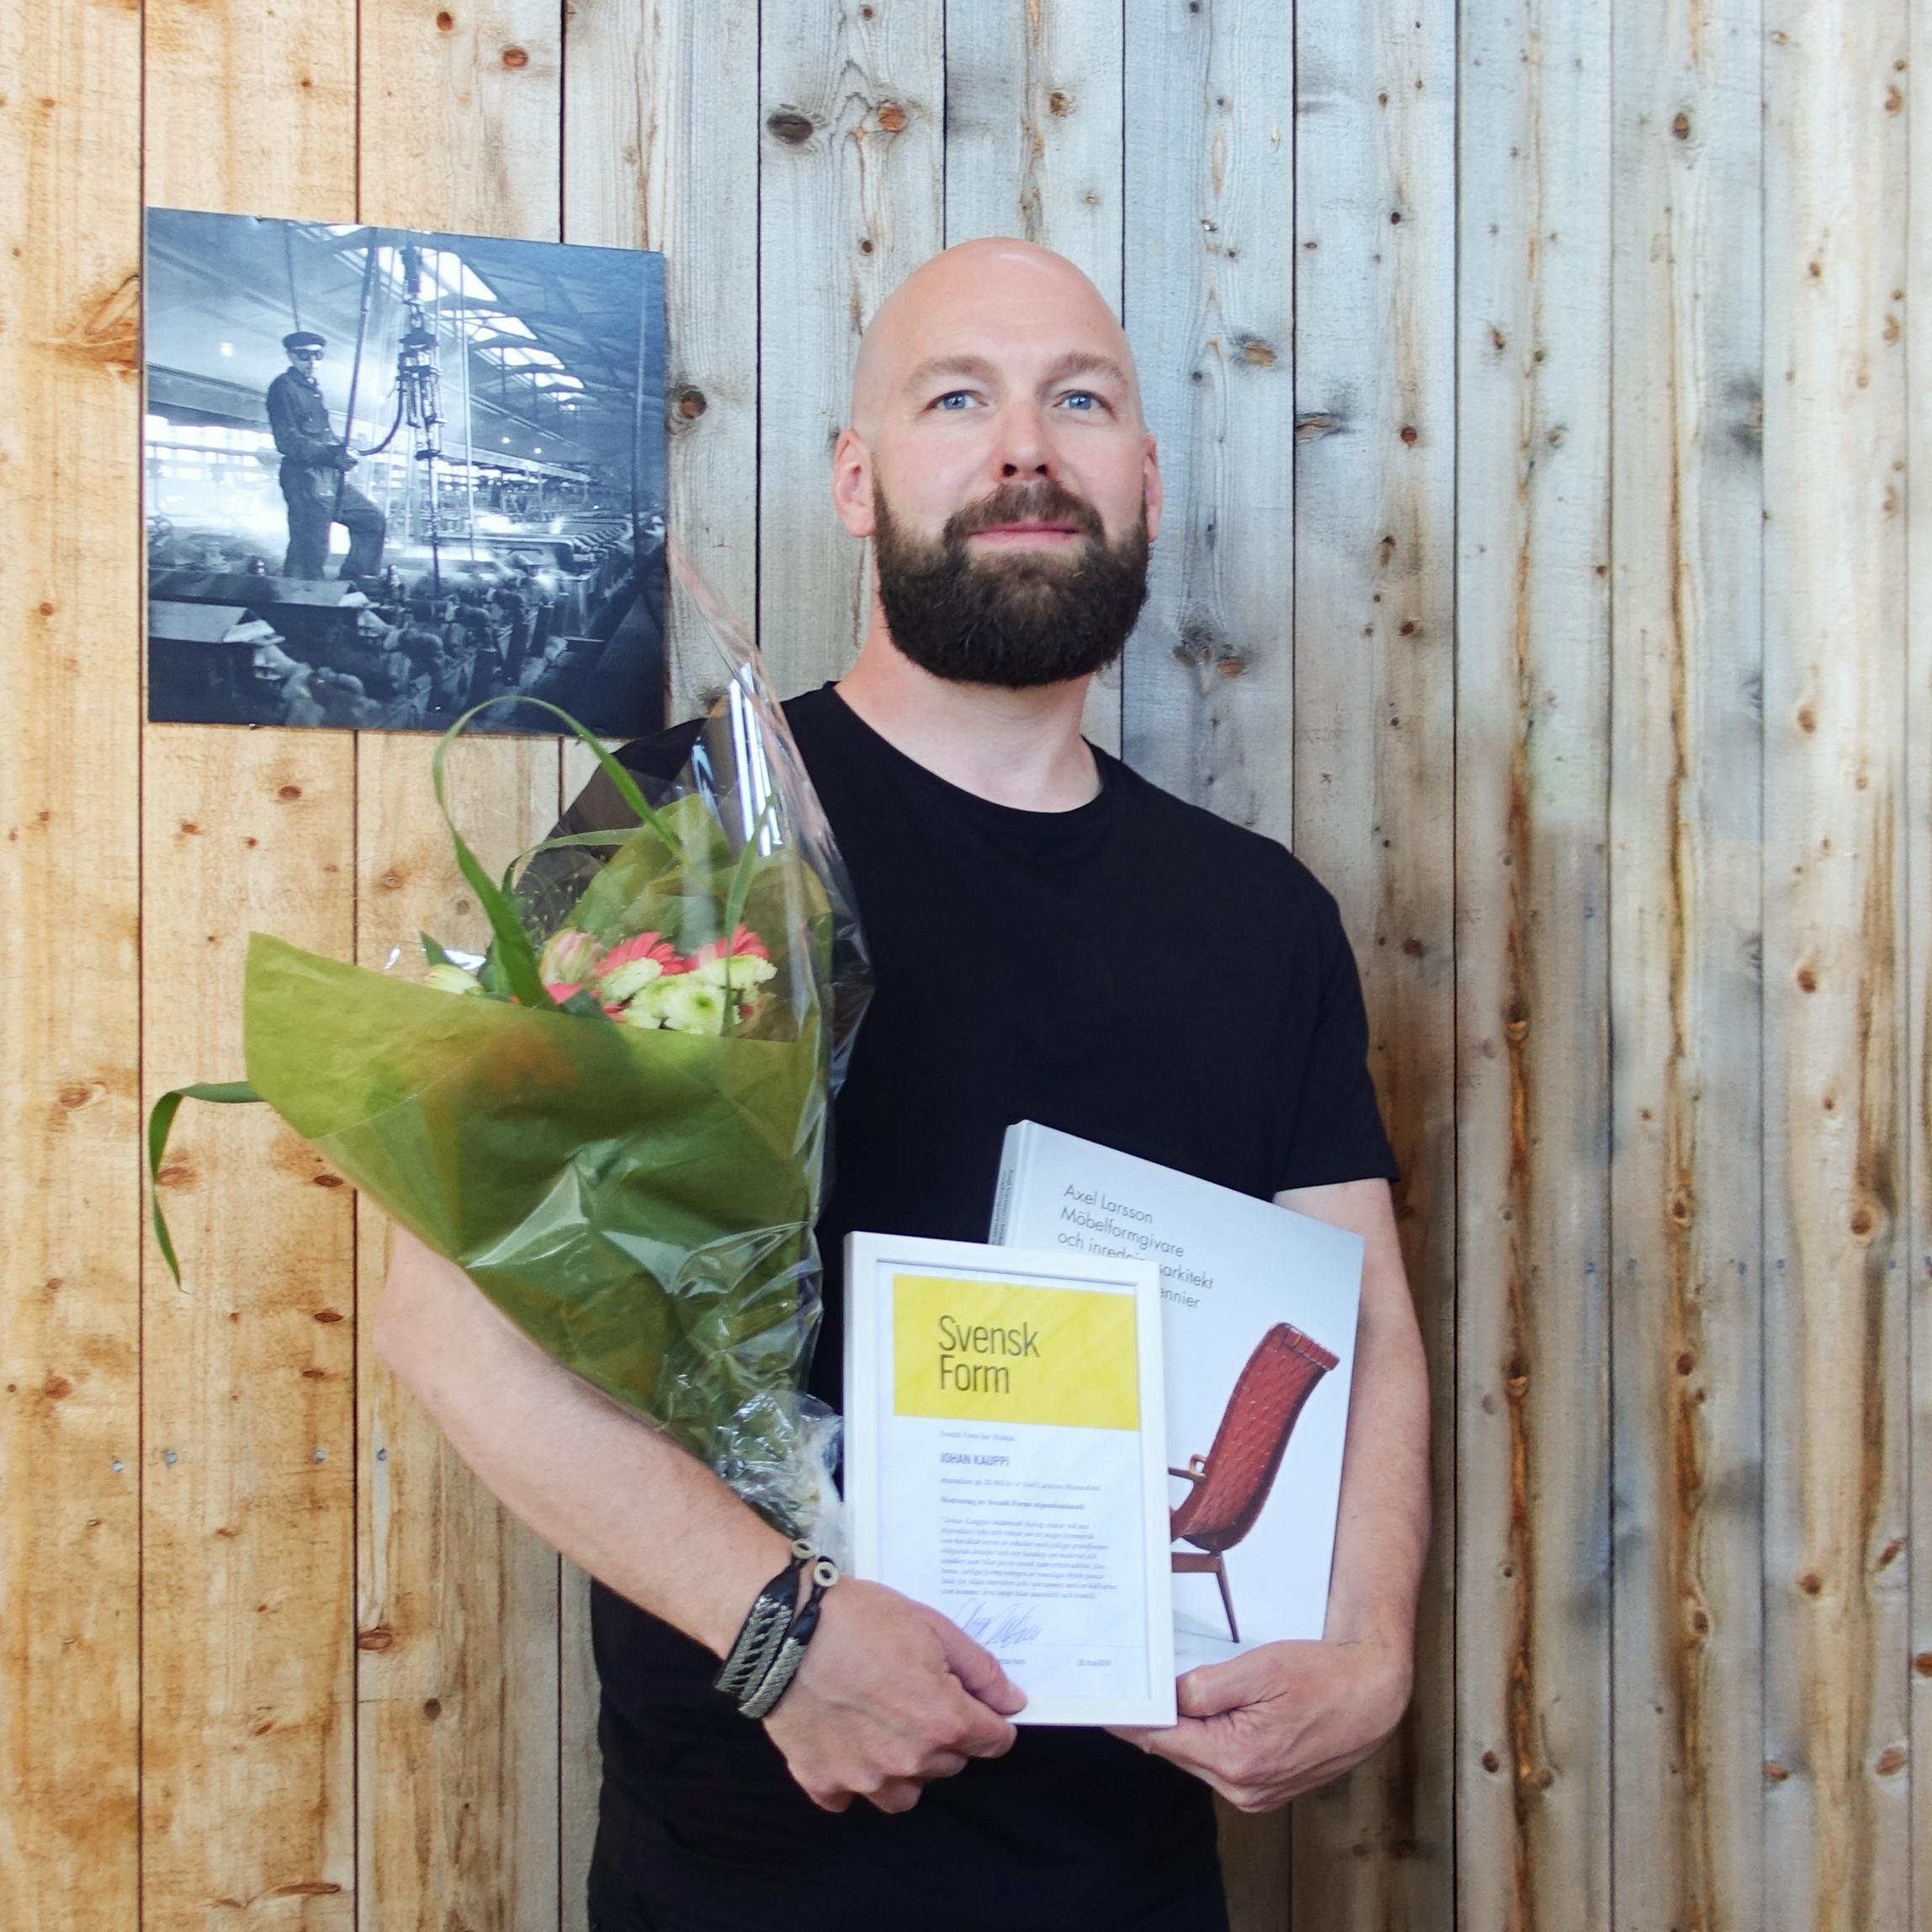 Svensk Form - Stipendiat 2018, Johan Kauppi